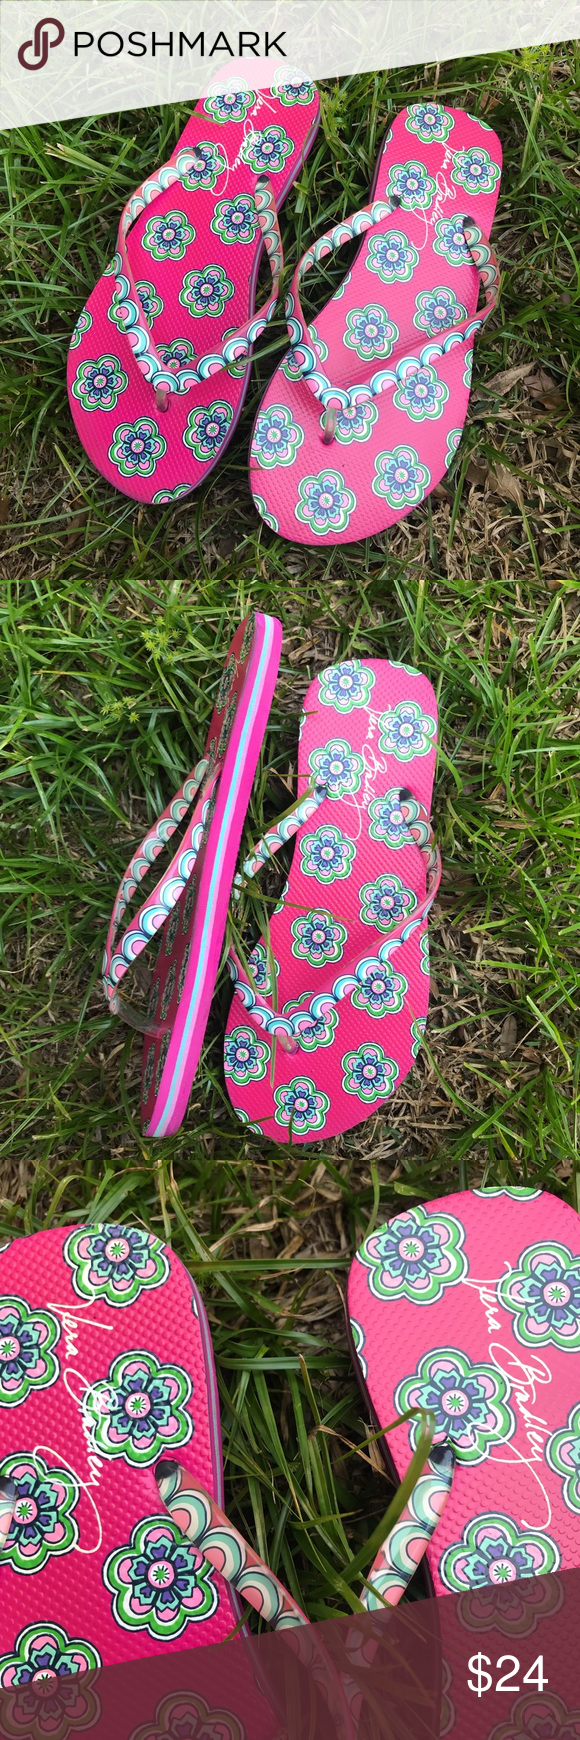 374d39db991f Vera Bradley Pink Swirls Flowers 7 8 Flip Flips This is a pair of Vera